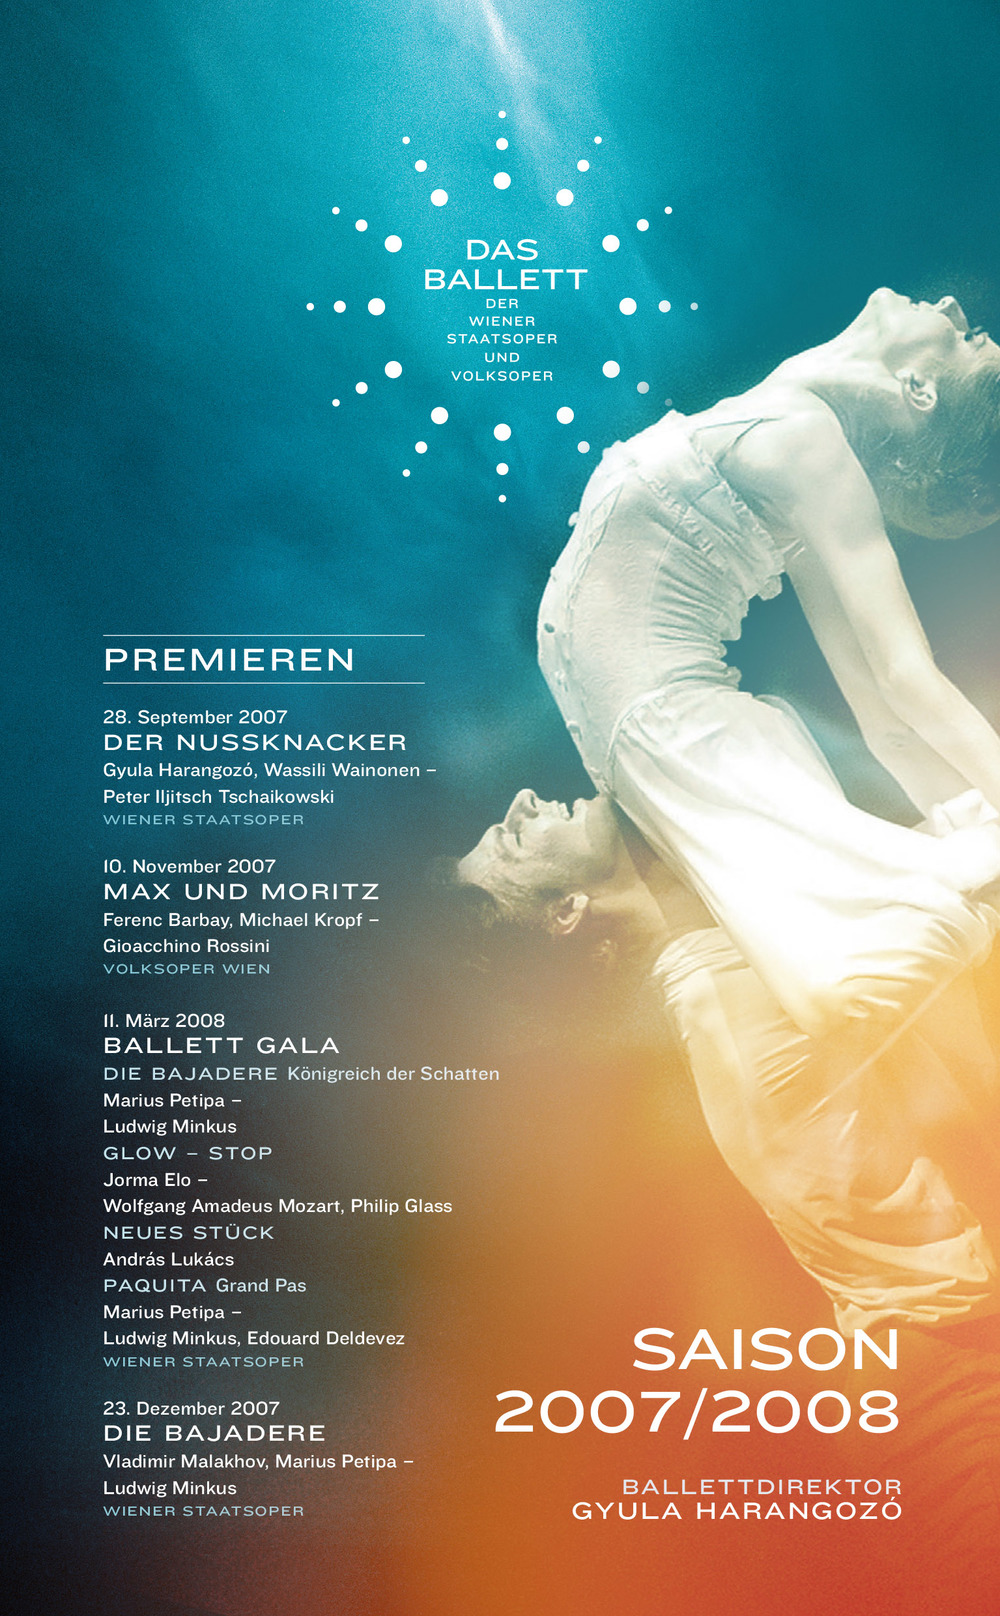 balletposter.jpg